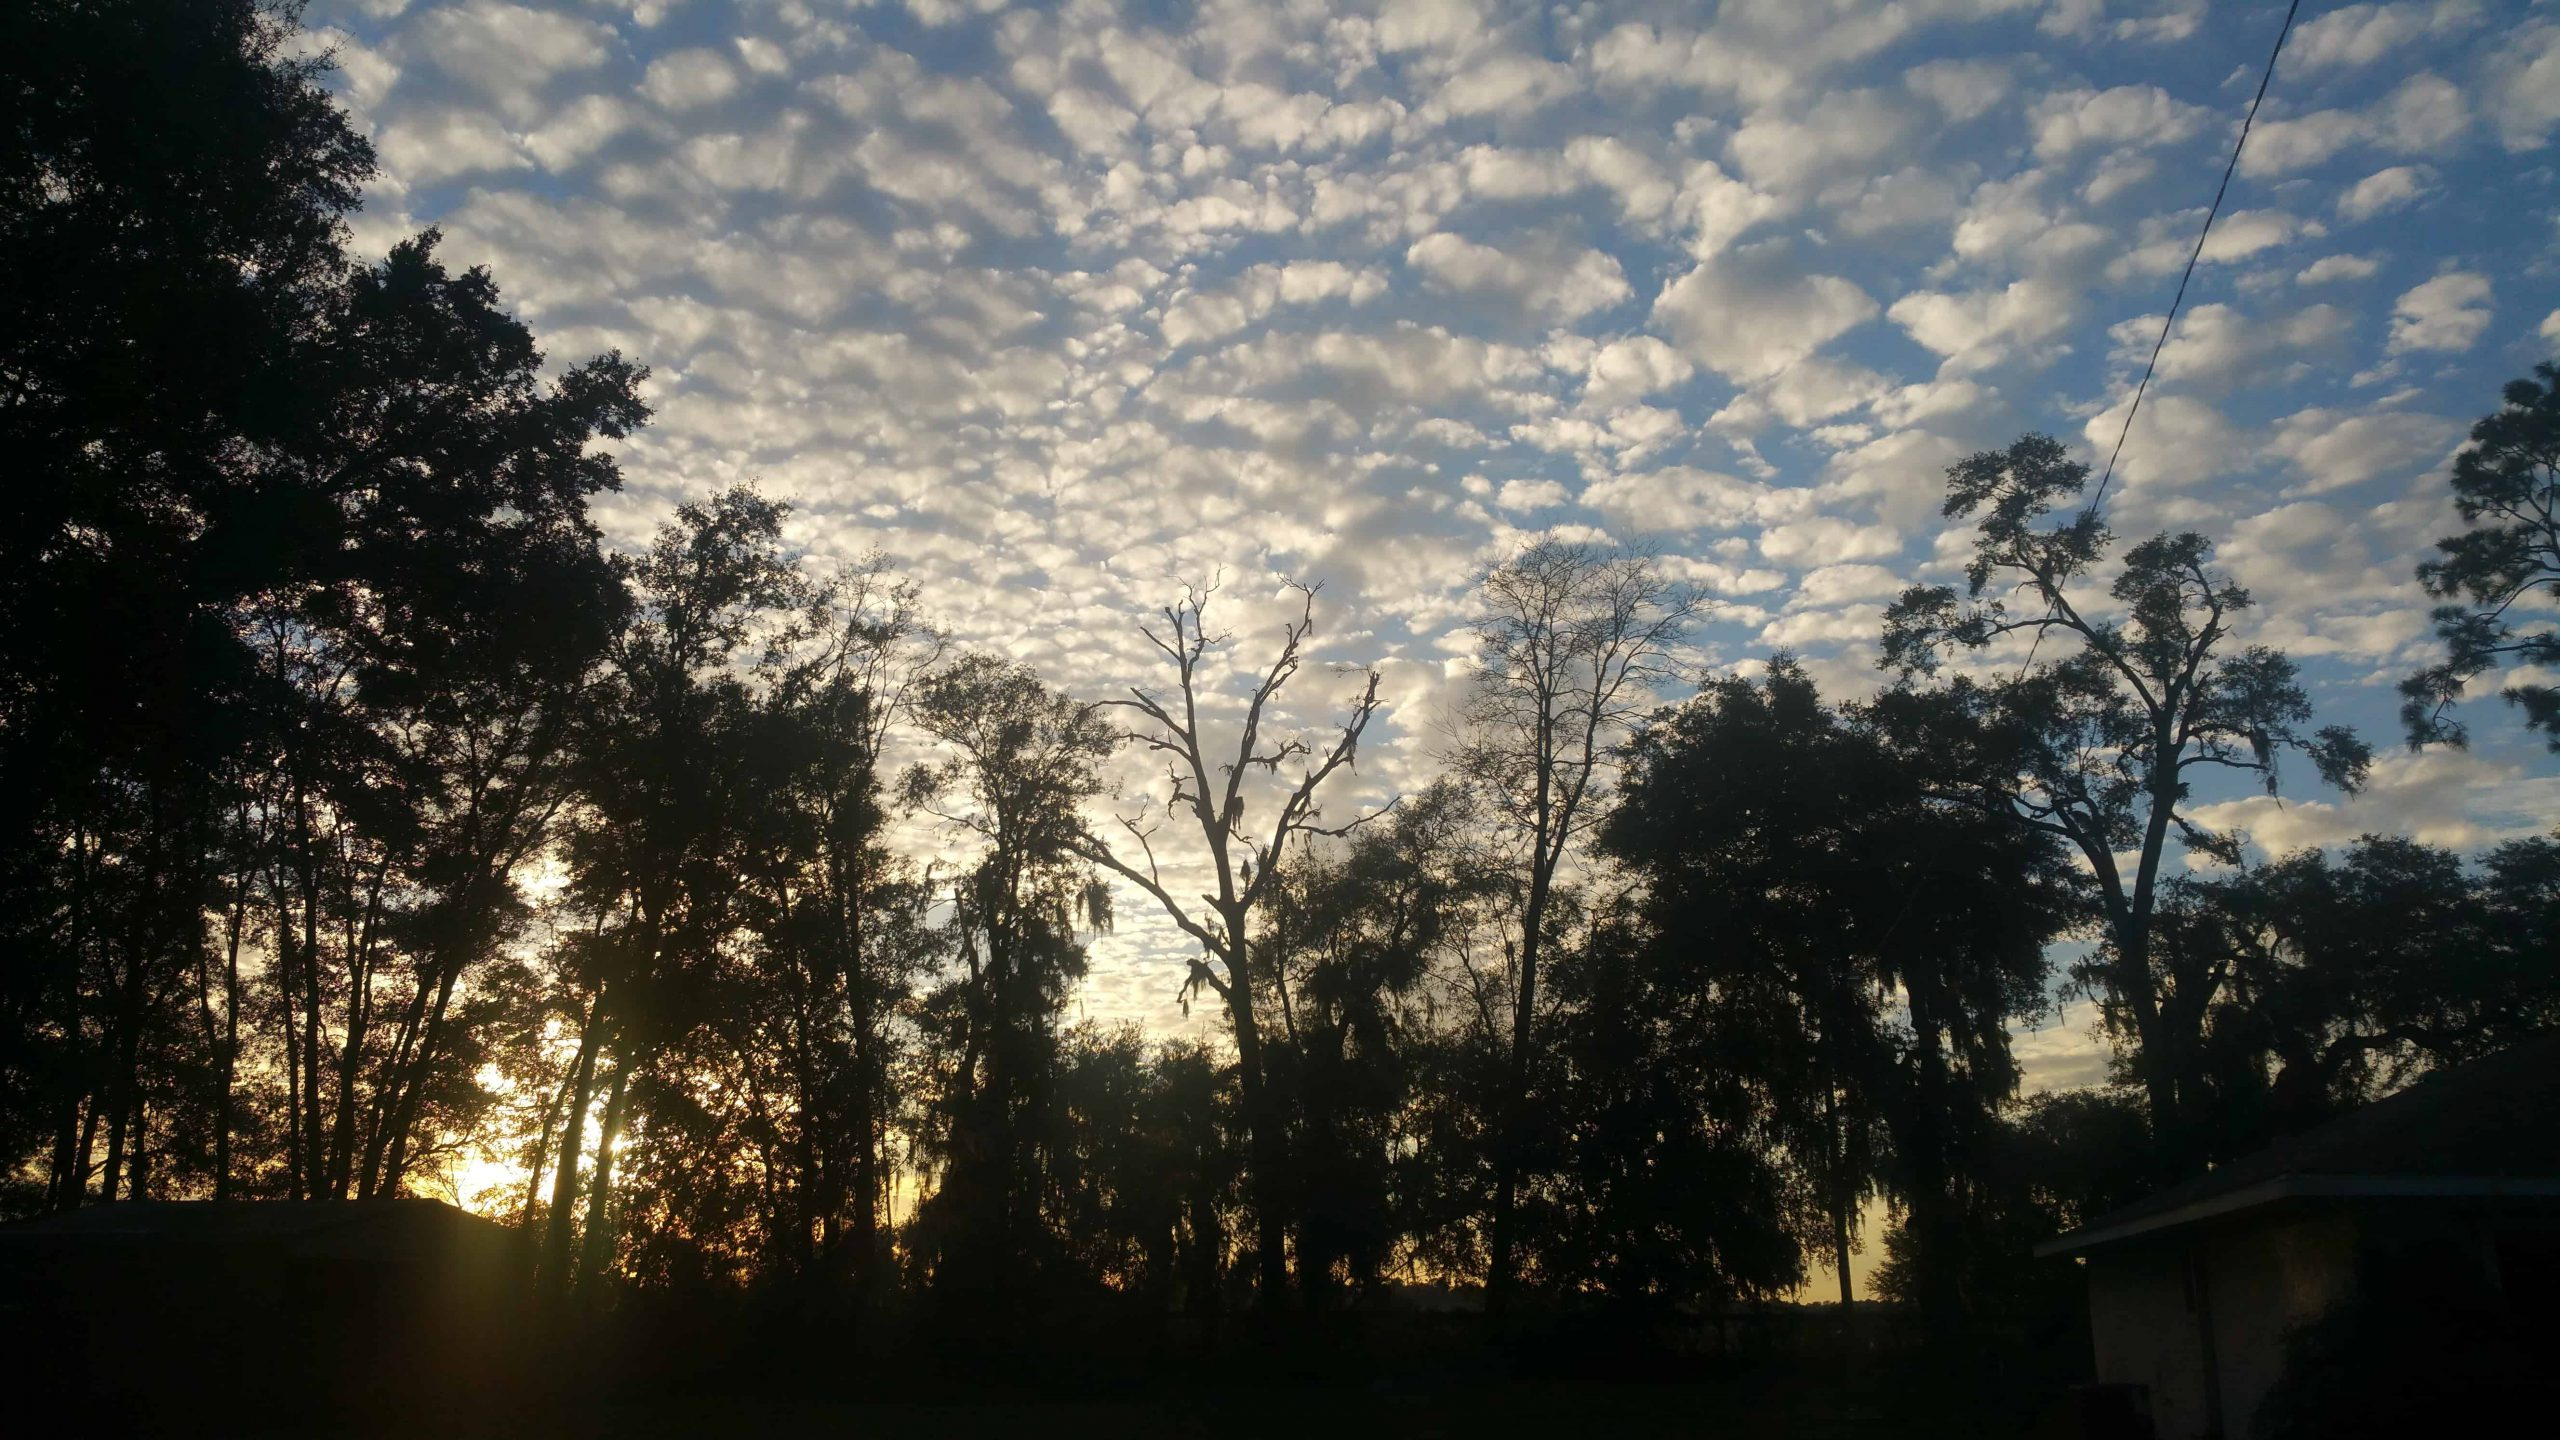 Clouds - December 14, 2017 - 6